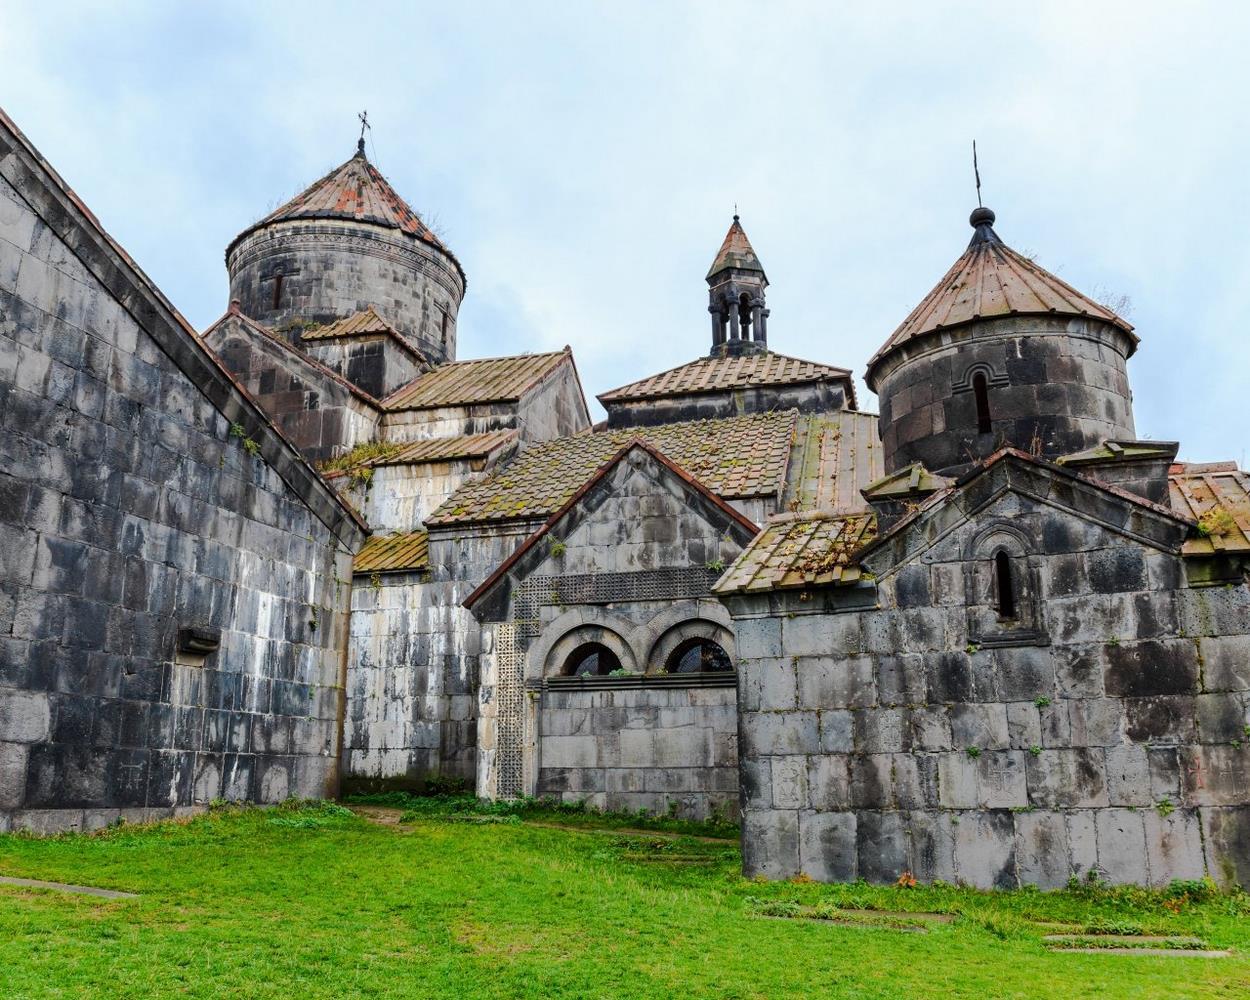 صومعهٔ هاقپات ارمنستان